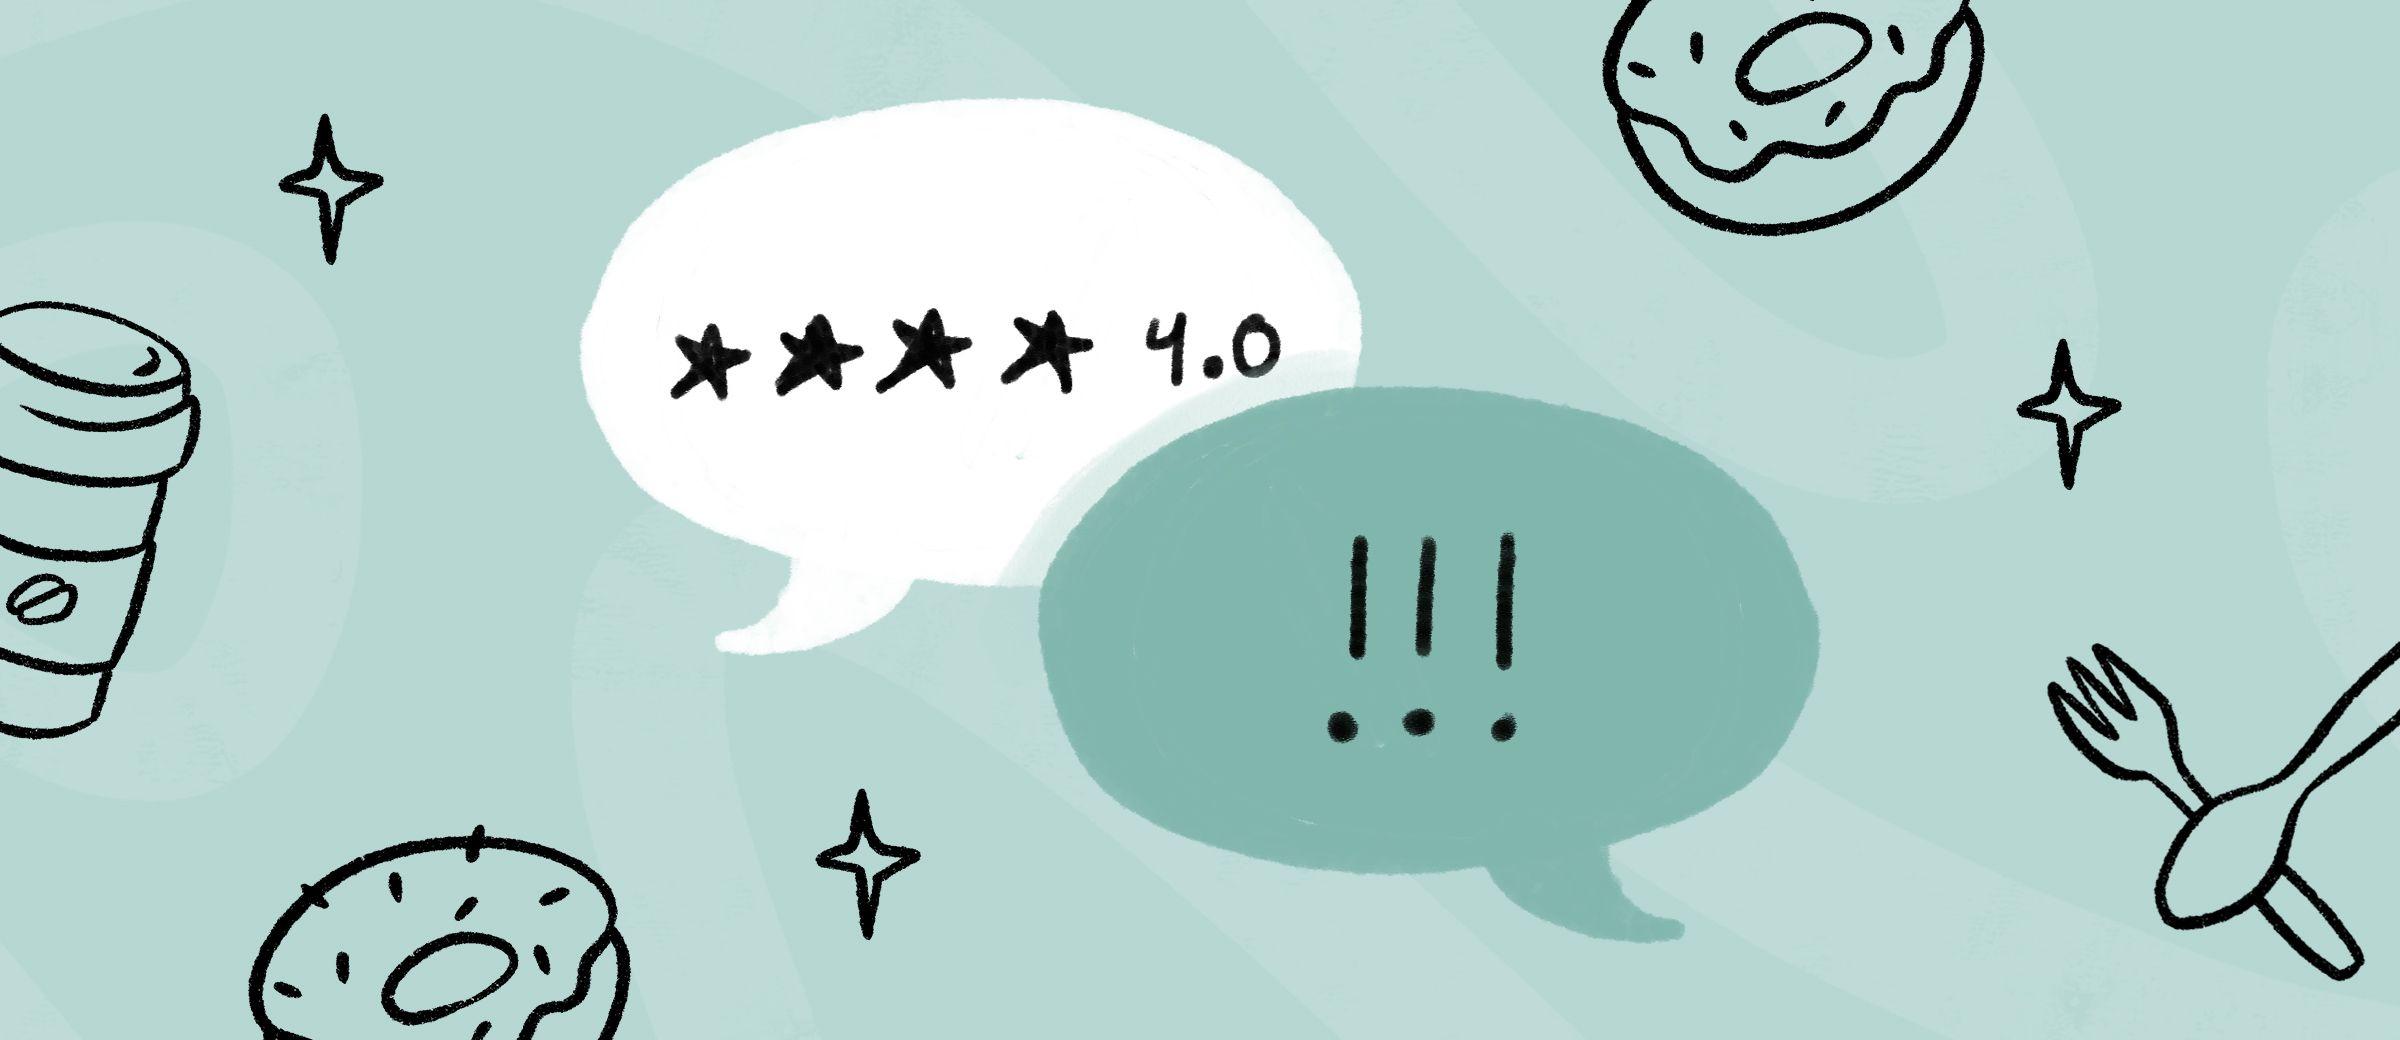 How to Respond to Restaurant Reviews on Social Media